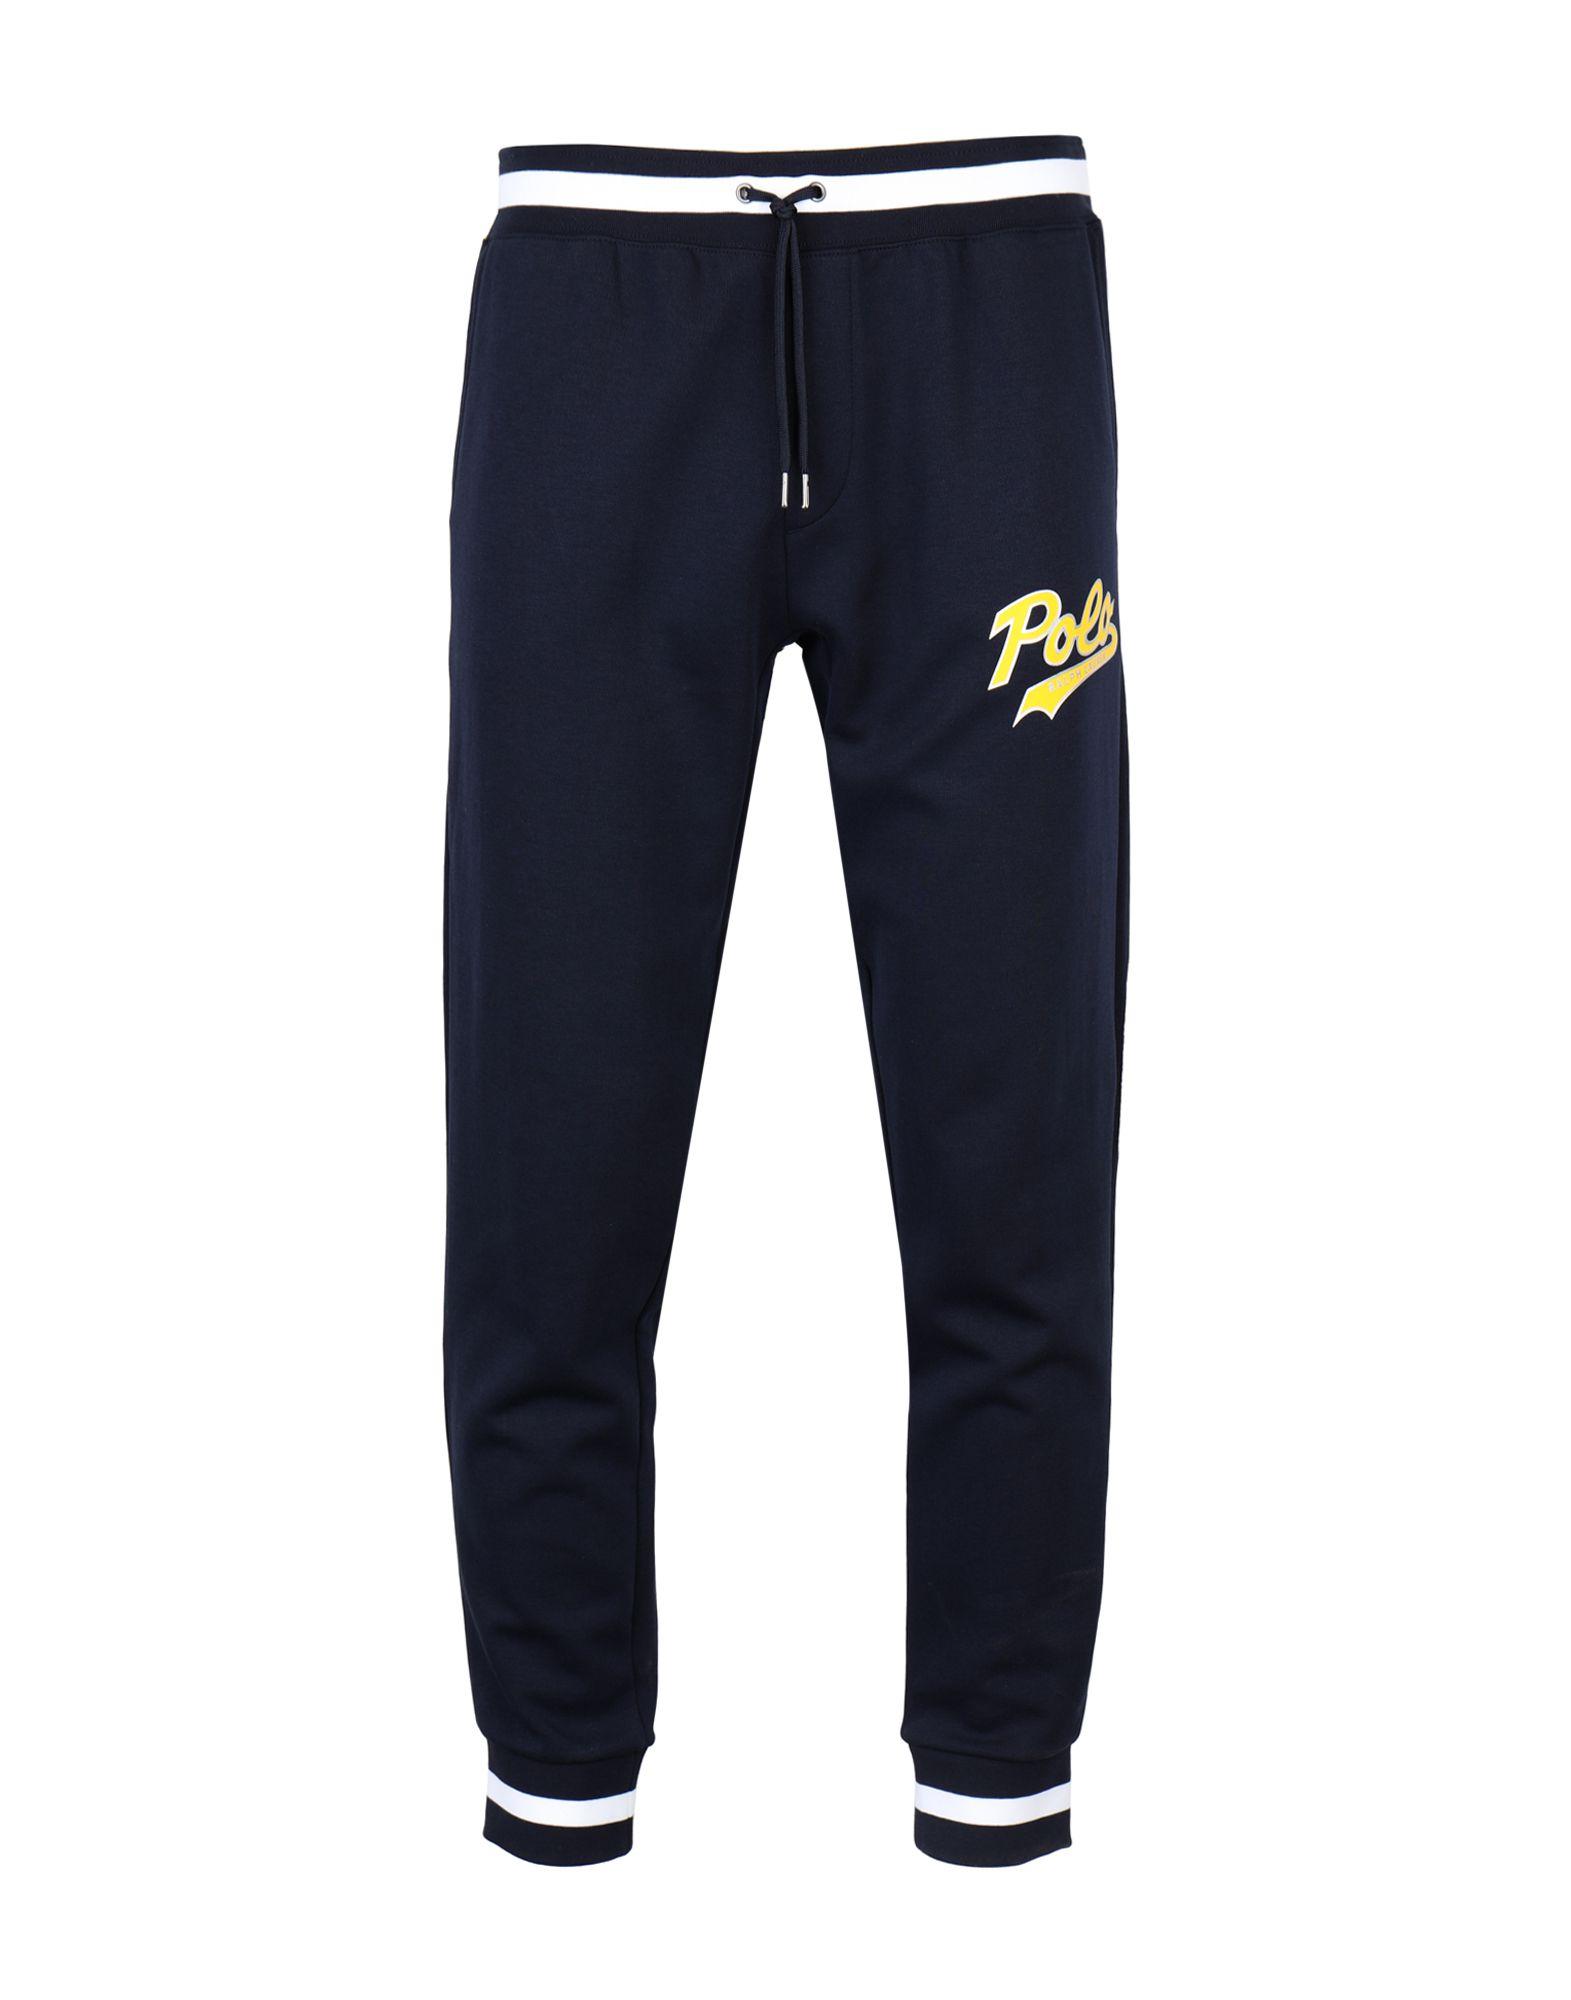 Pantalone Polo Ralph Lauren Double-Knit Graphic Jogger - herren - 13313811MG